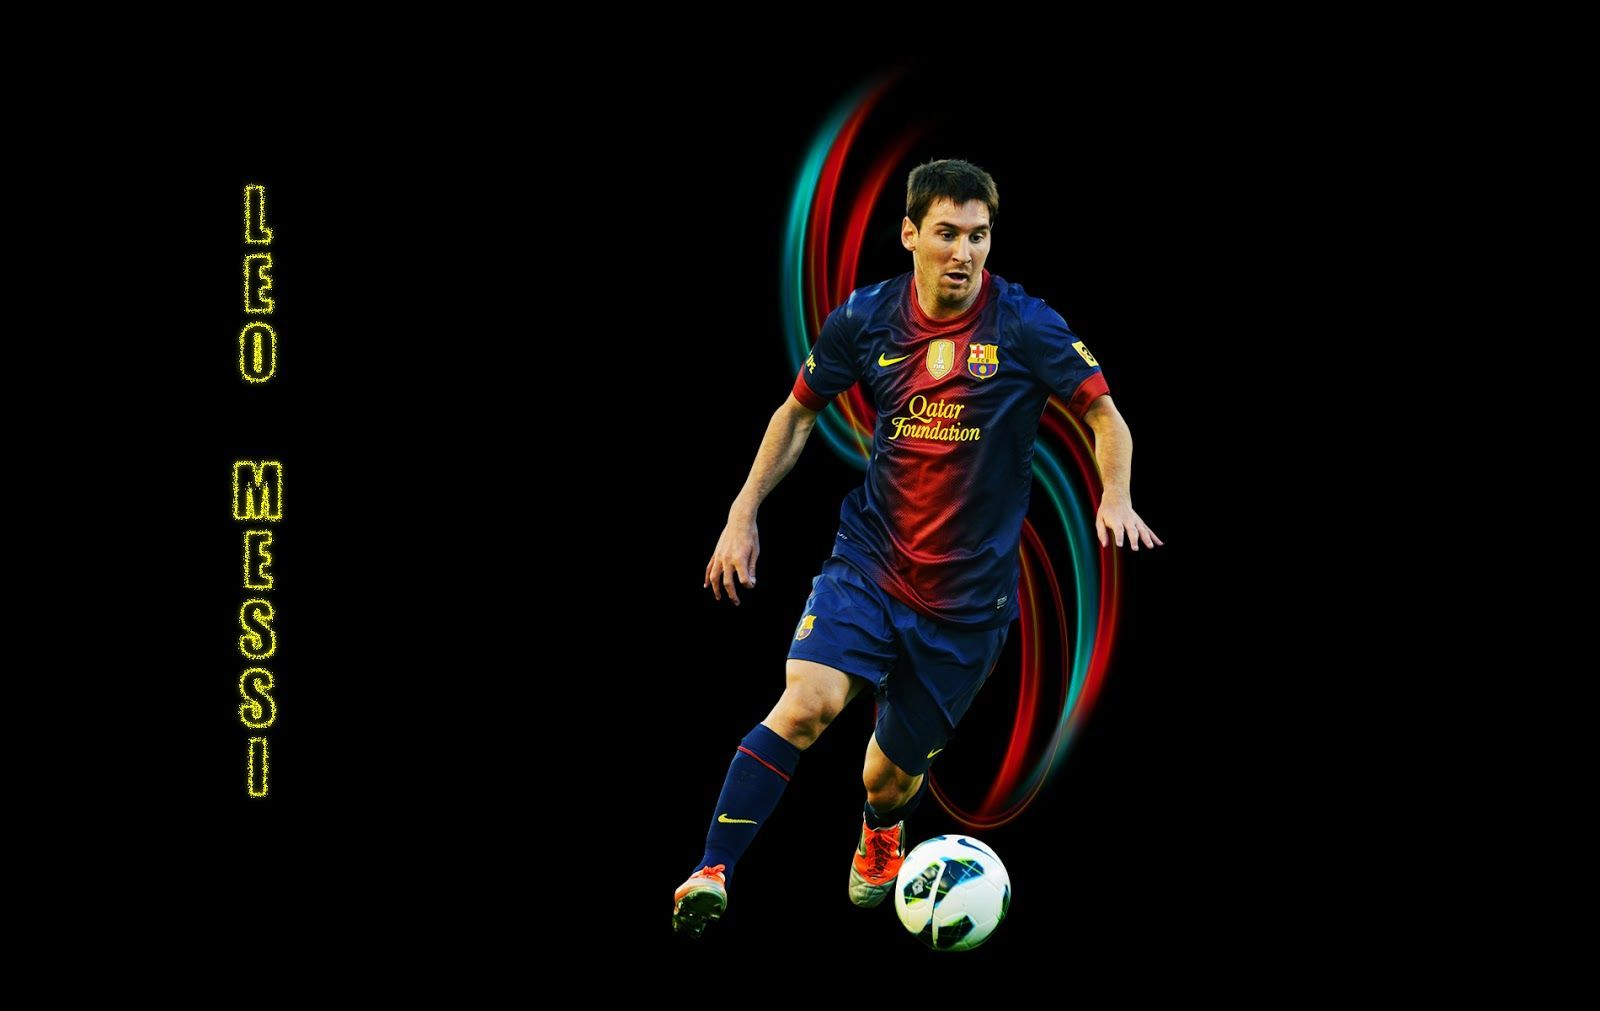 Lionel Messi Wallpapers HD p Wallpaper